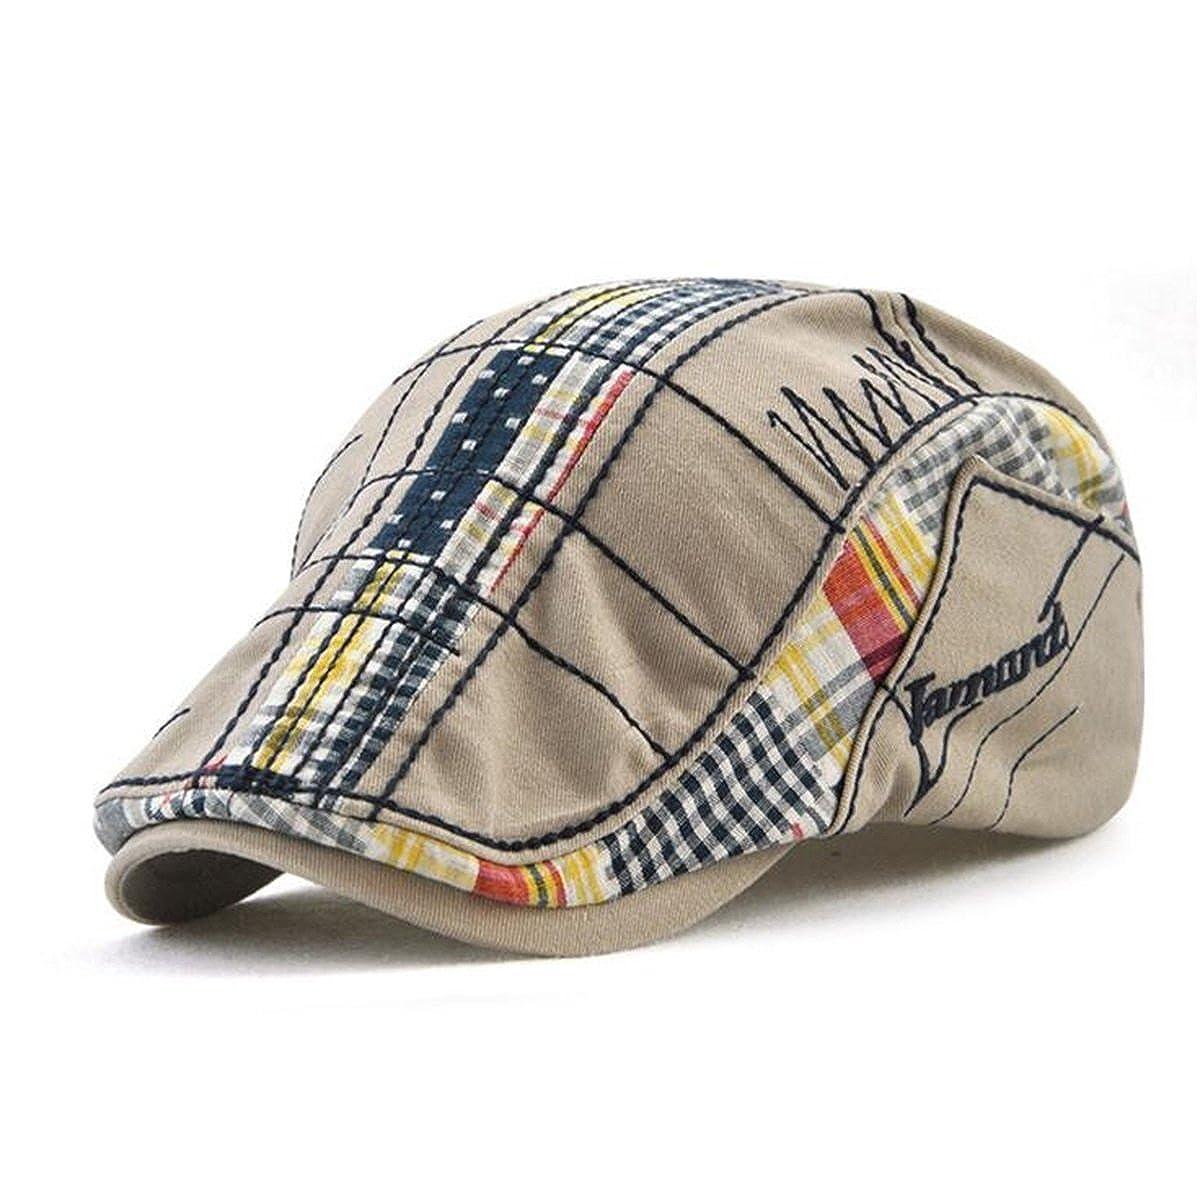 FayTop Men s Women s Newsboy Cap Ivy Irish Flat Hat Cabbie Scally Cap  Cabbie Driving Caps Hats 12945-grey at Amazon Men s Clothing store  9d0e03cdc94